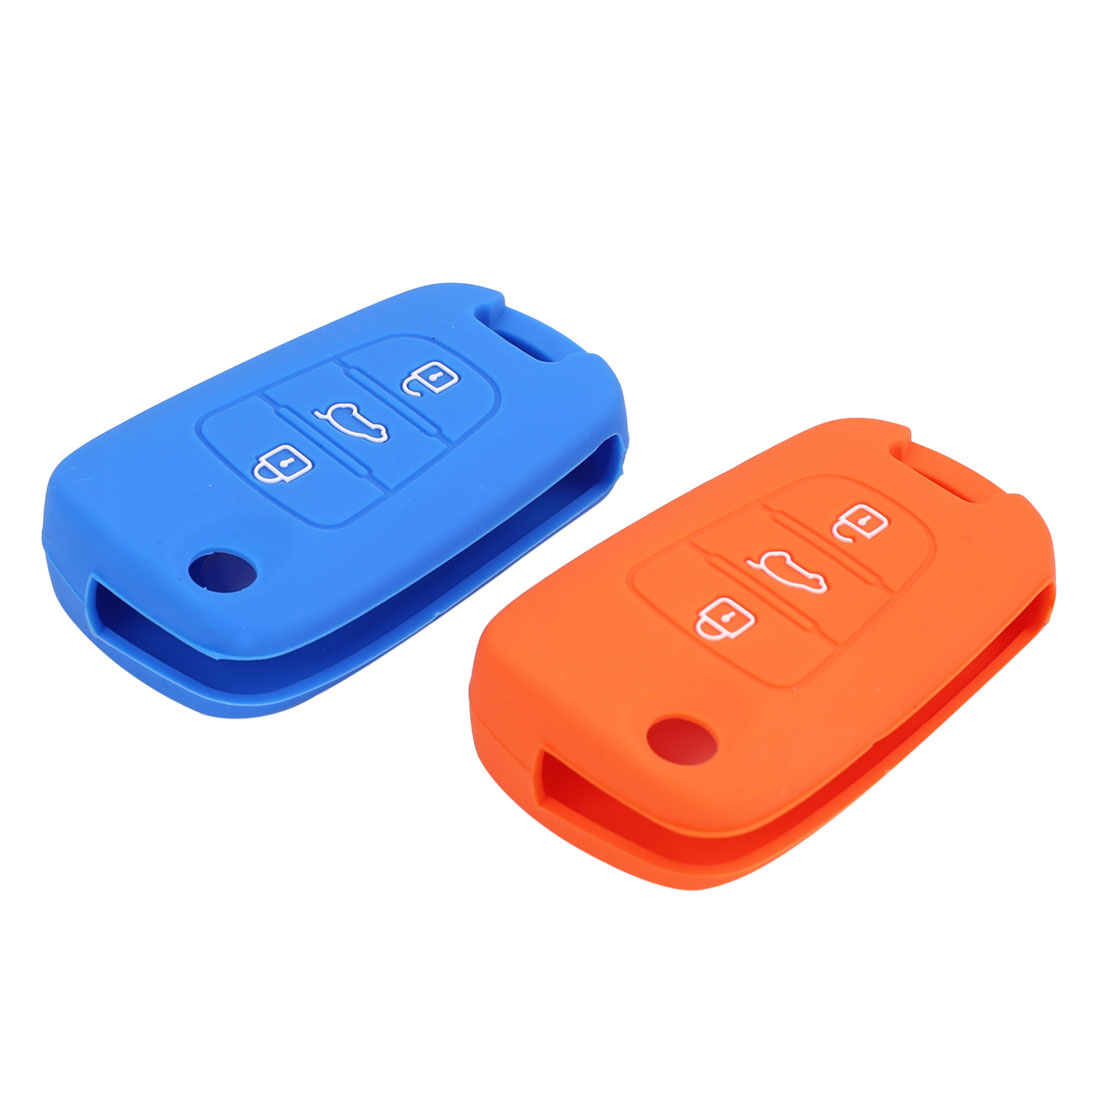 2PCS Orange Blue 3 Button Car Remote Key Case Holder Shell Cover for Hyundai I30 - image 1 of 3